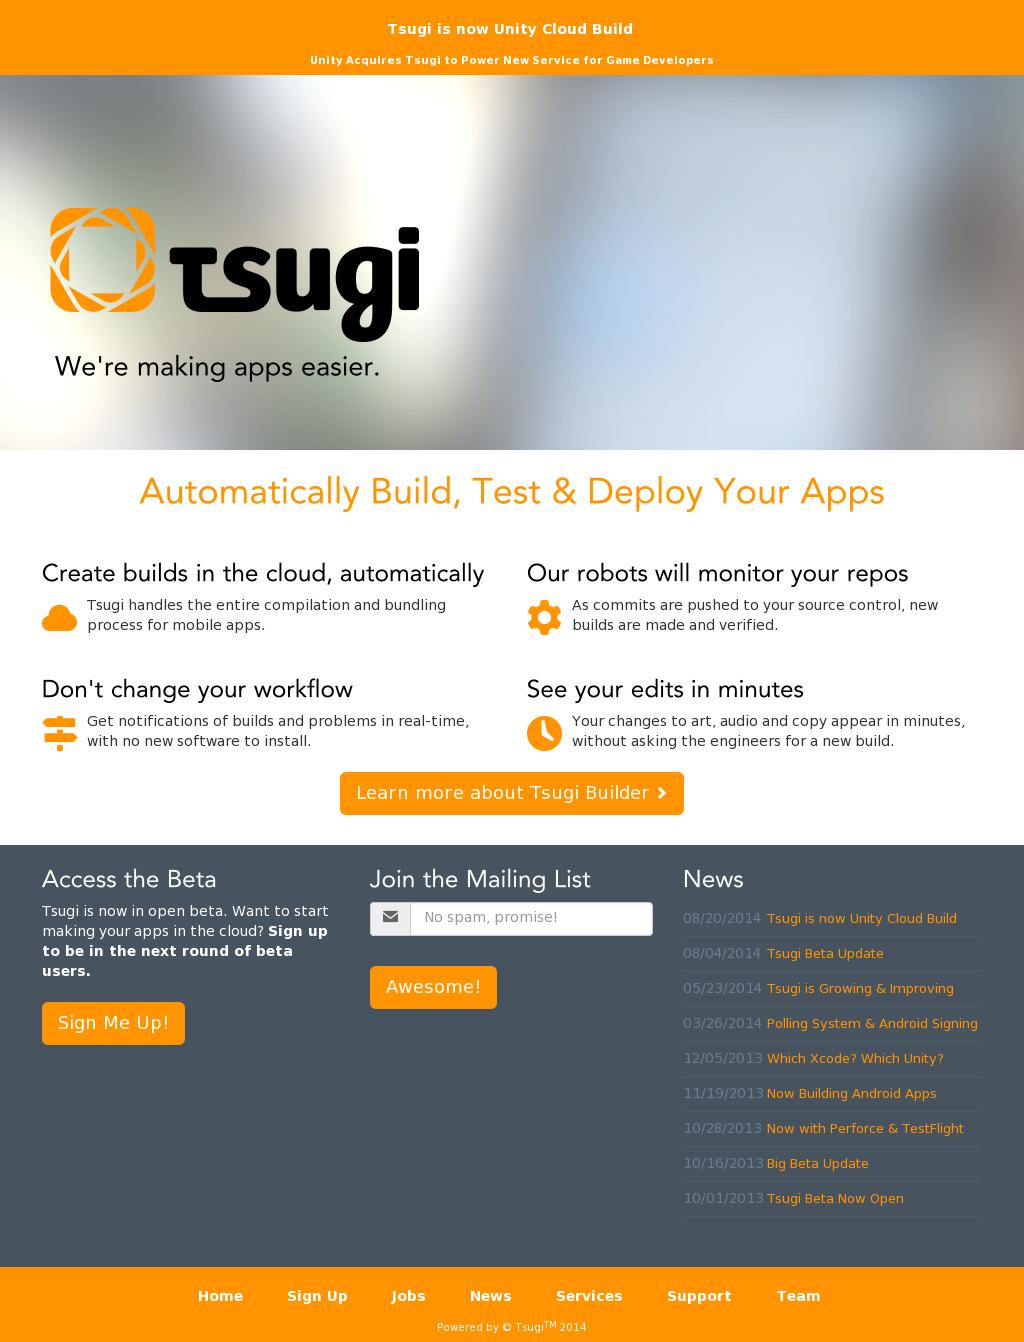 Owler Reports - Tsugi: Startup Tsugi acquired by San